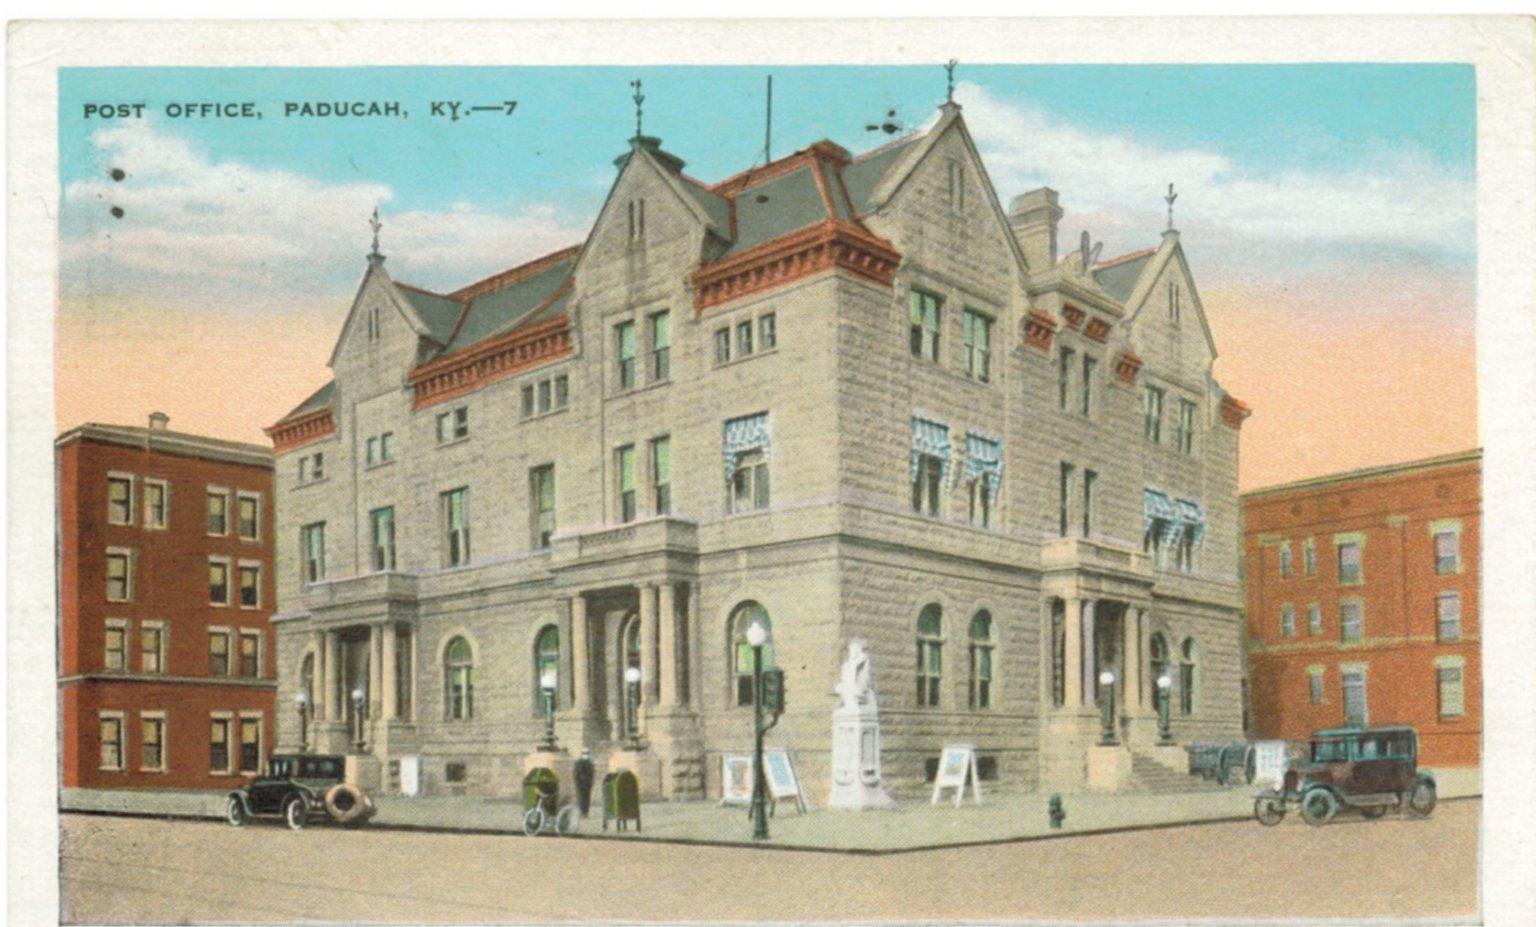 Post Office, Paducah, Ky.